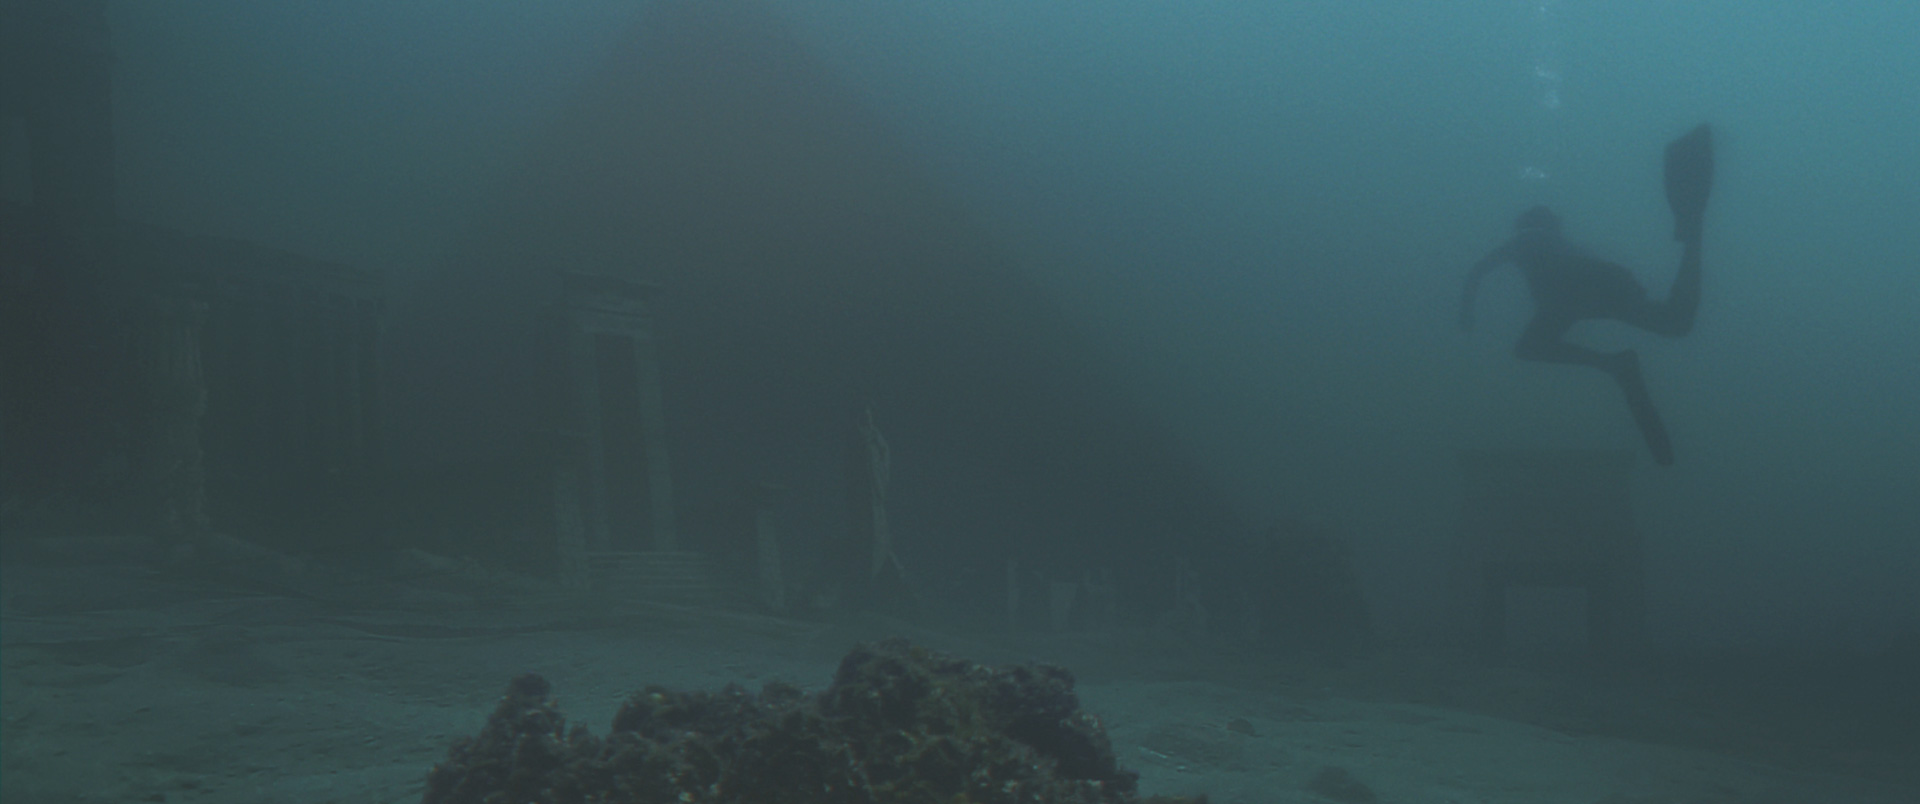 Pino Gengo: The Broken Key - Underwater